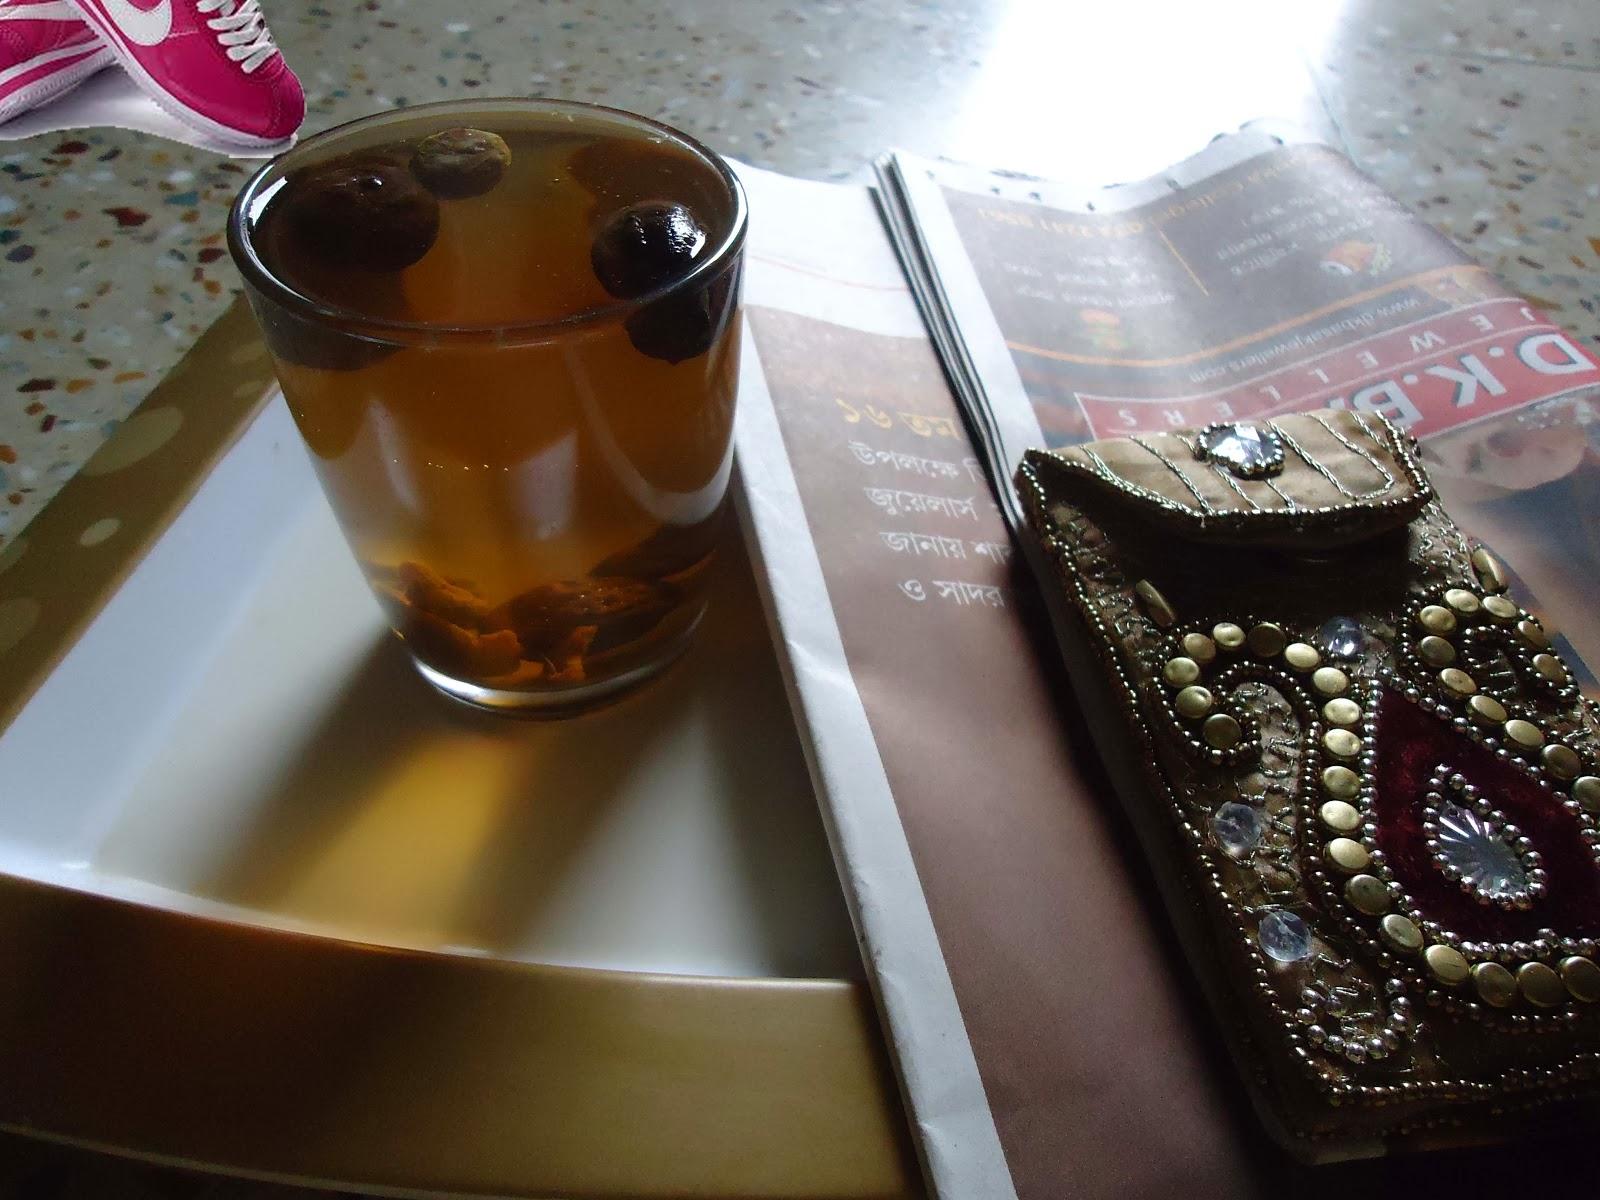 Triphala drink containing three seeds amloki, bahera and haritaki